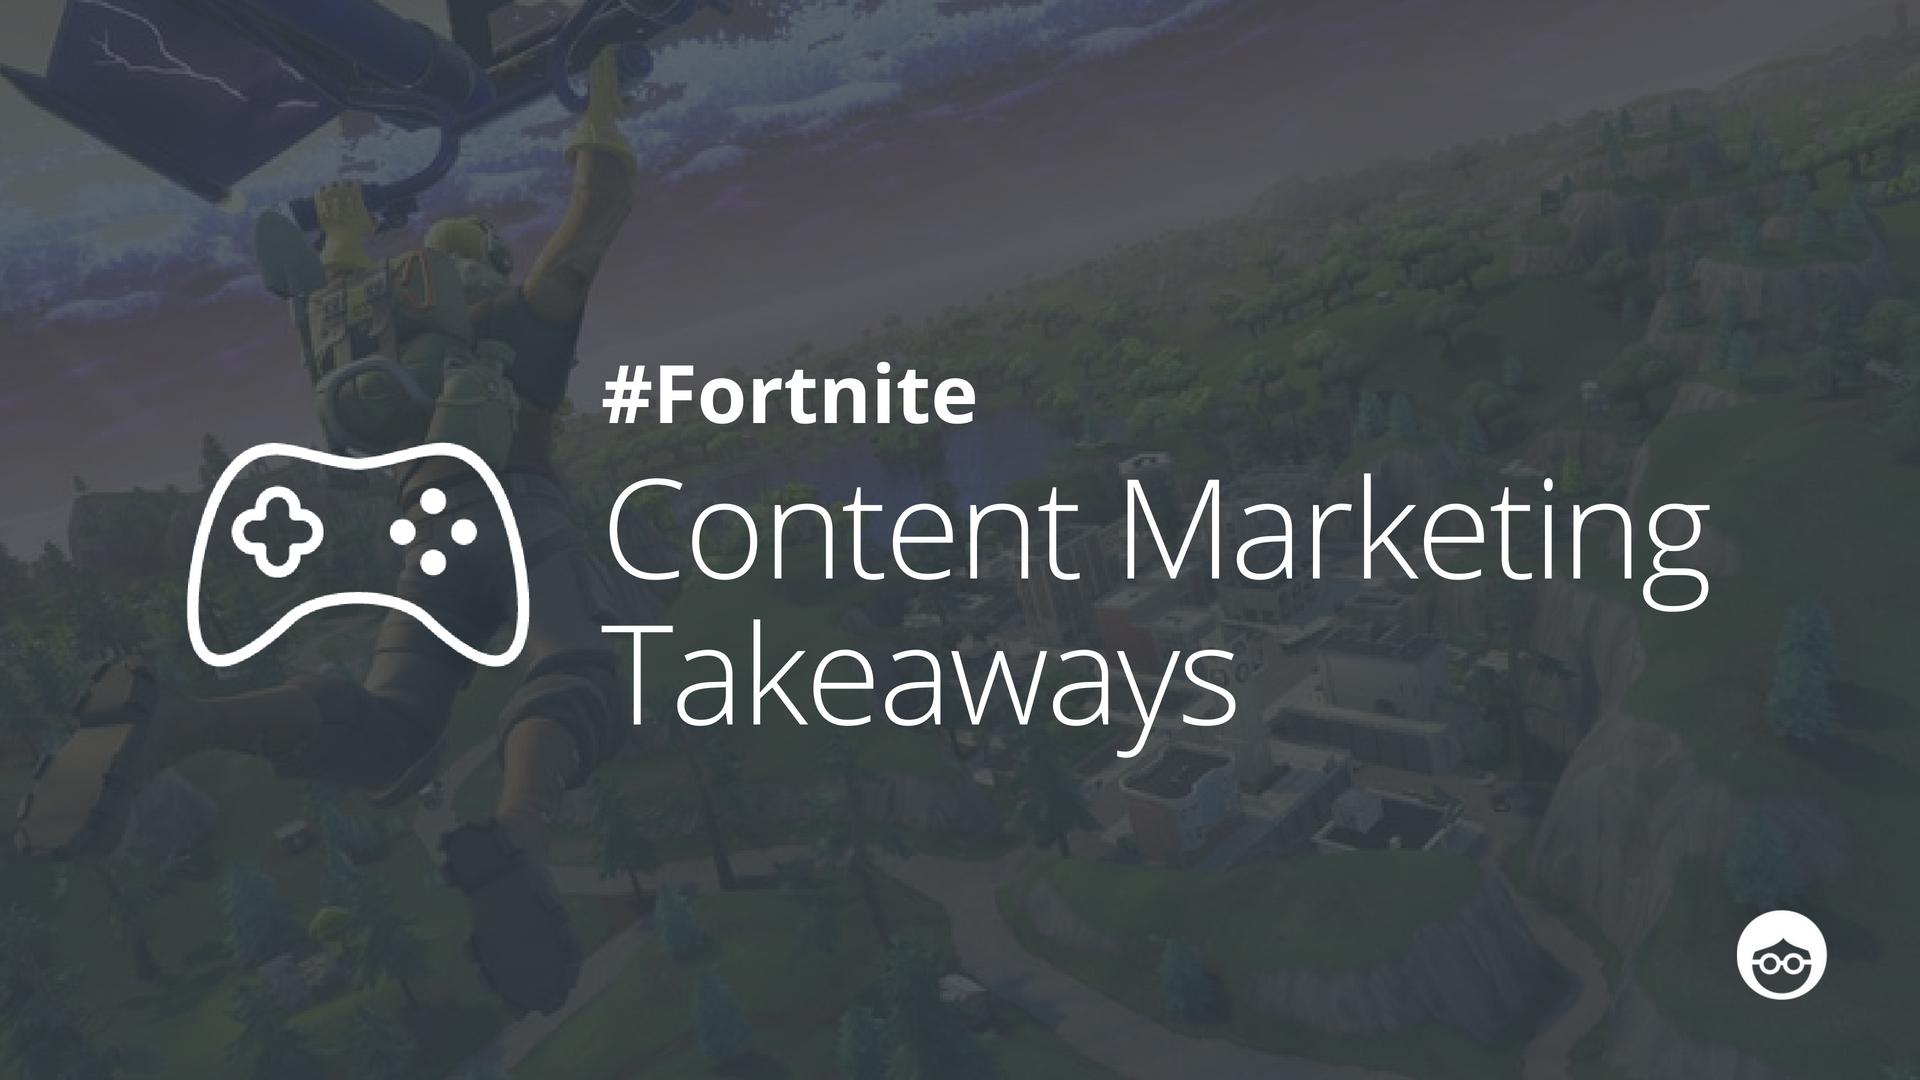 Fortnite content marketing